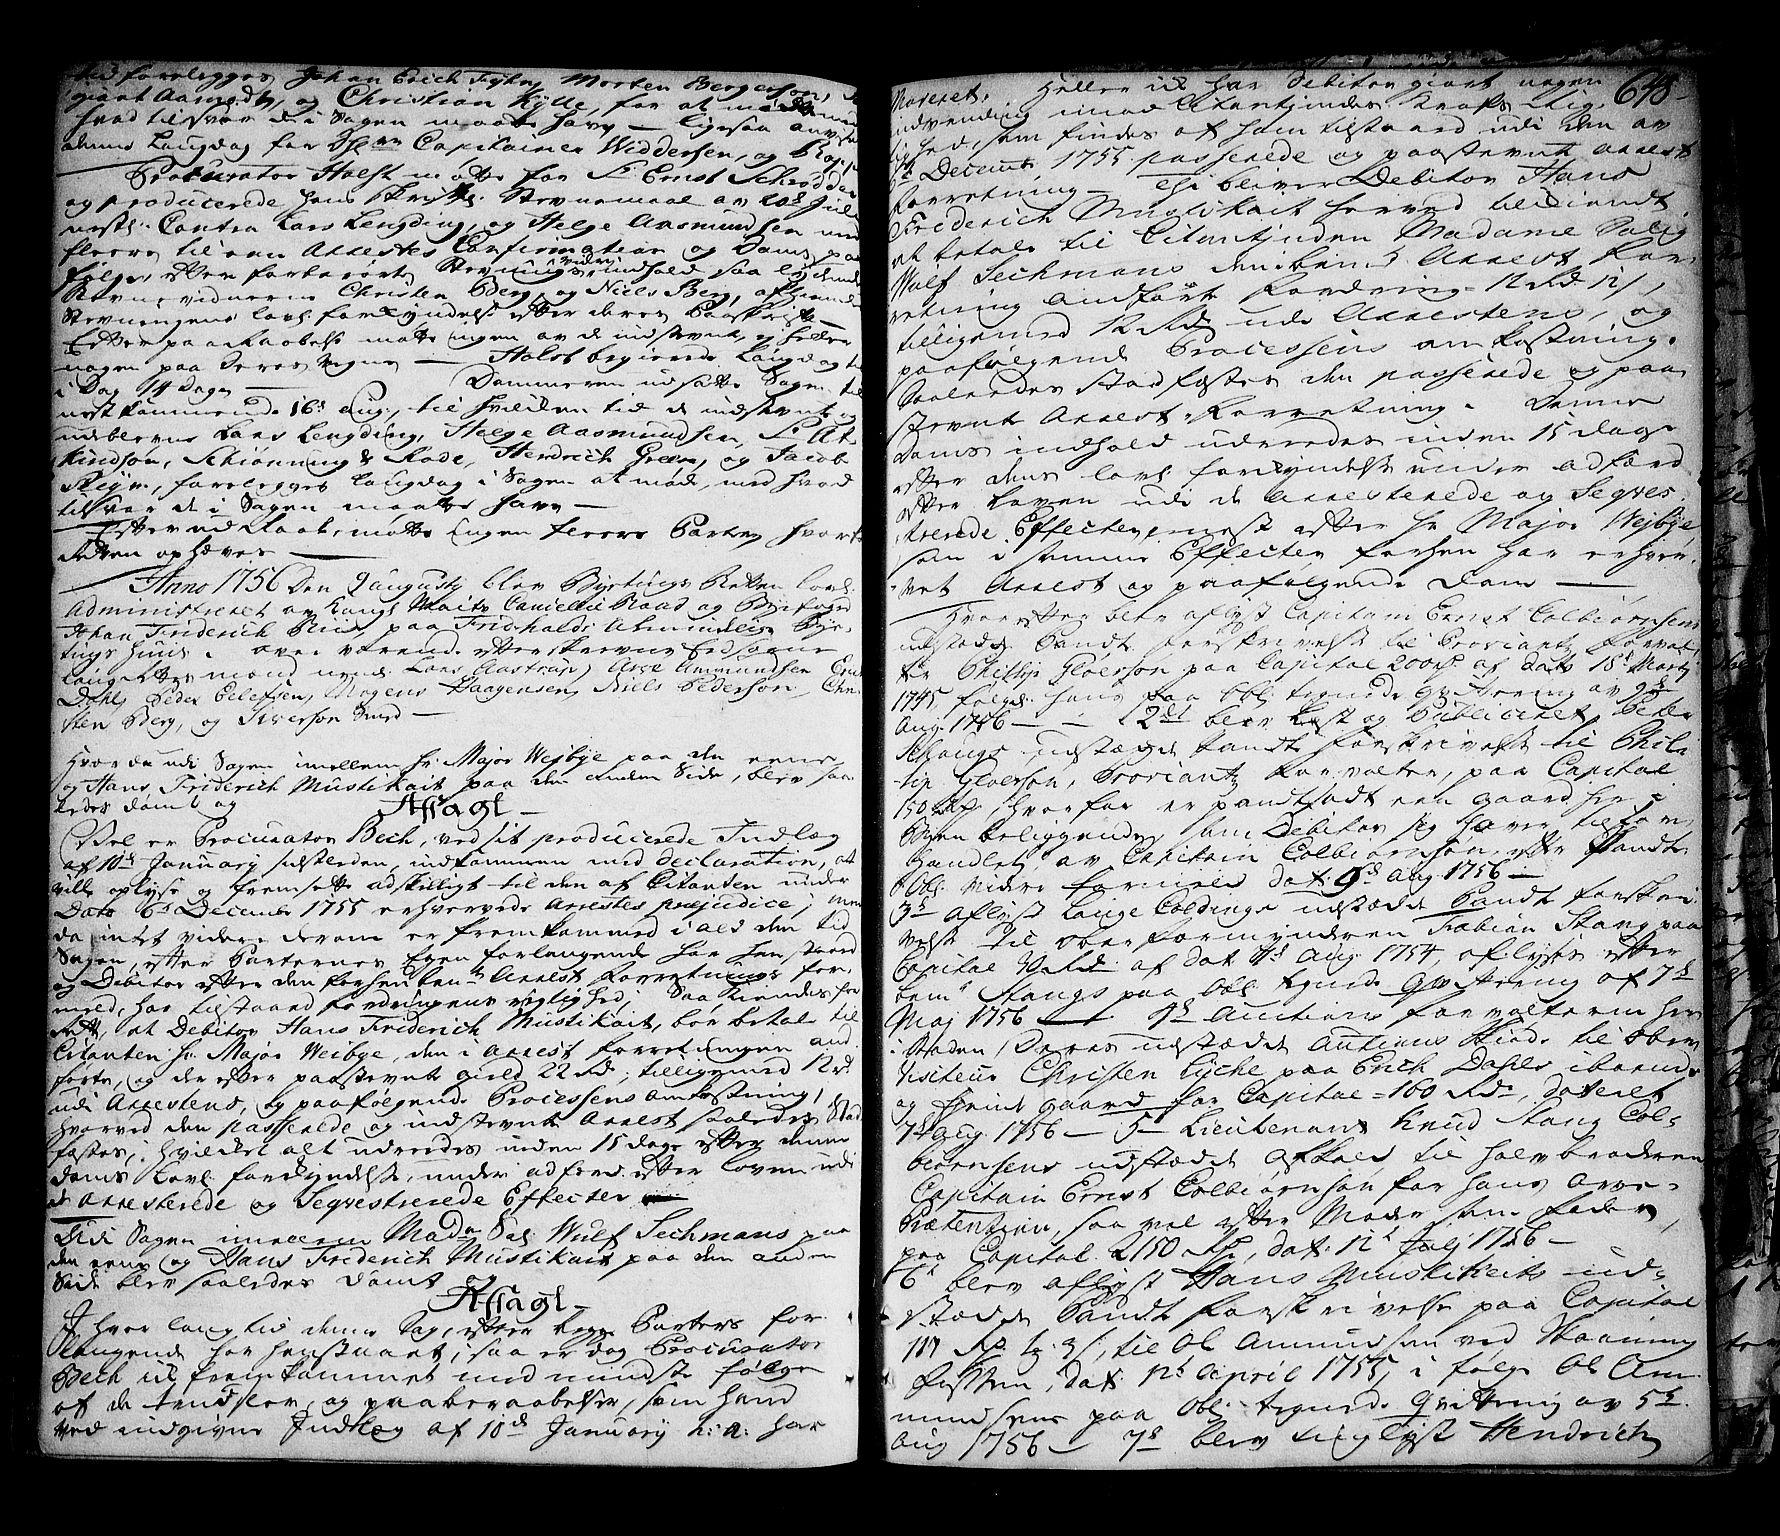 SAO, Halden byfogd, F/Fb/L0010: Tingbok, 1750-1756, s. 647b-648a